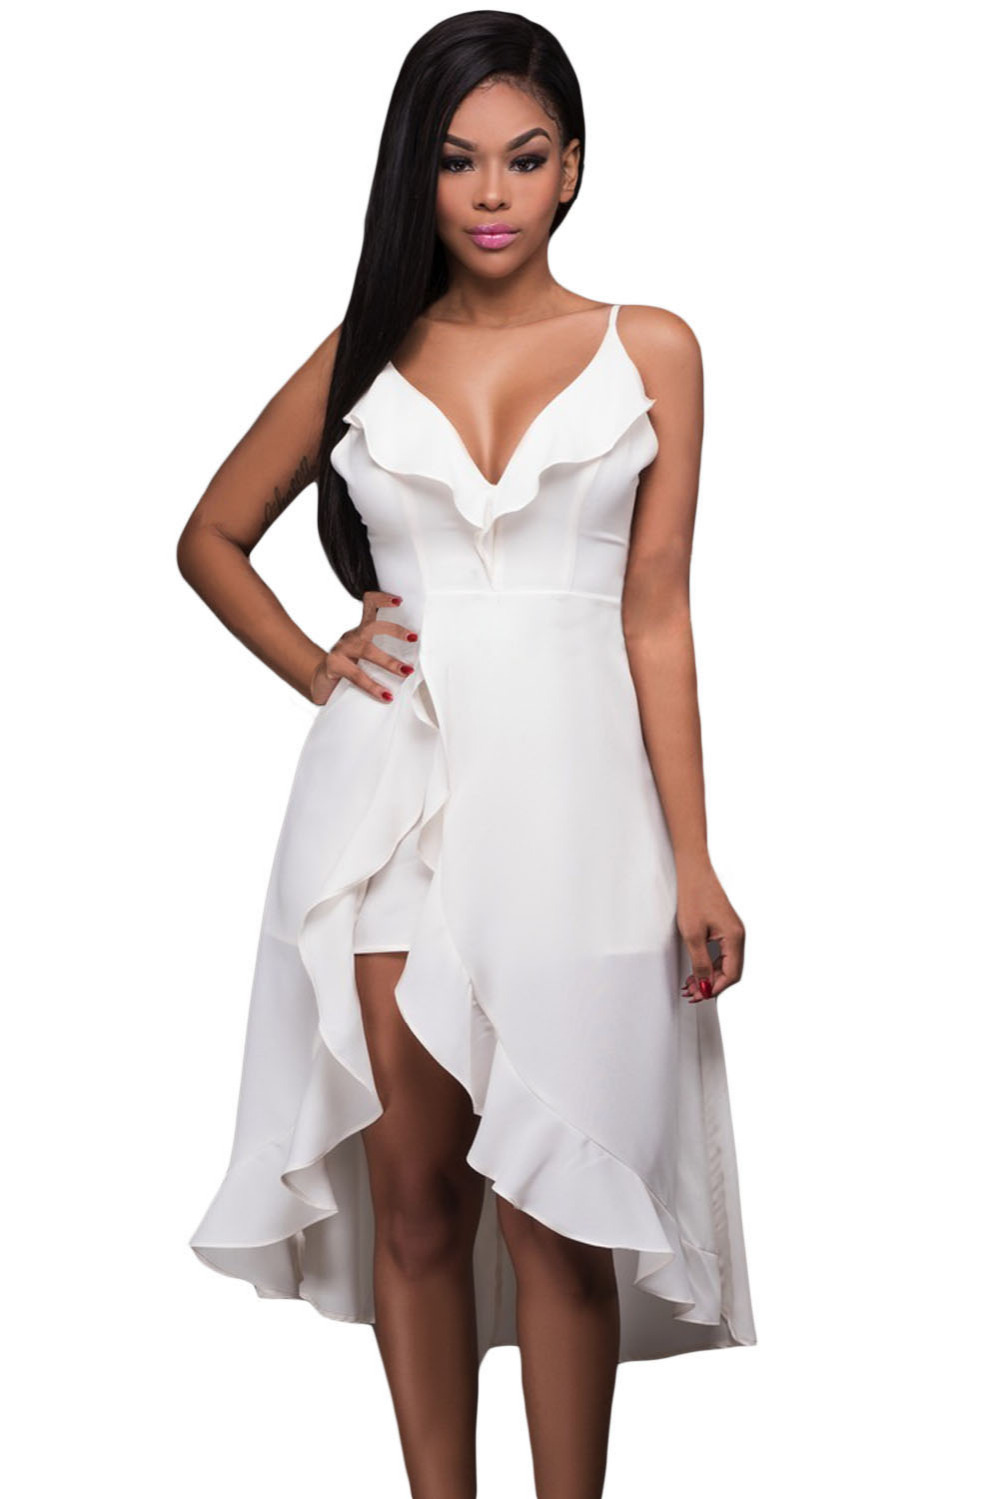 Fashion Dresses Accessories: Sexy Shoulder Spaghetti Strap Night Club Wear Summer